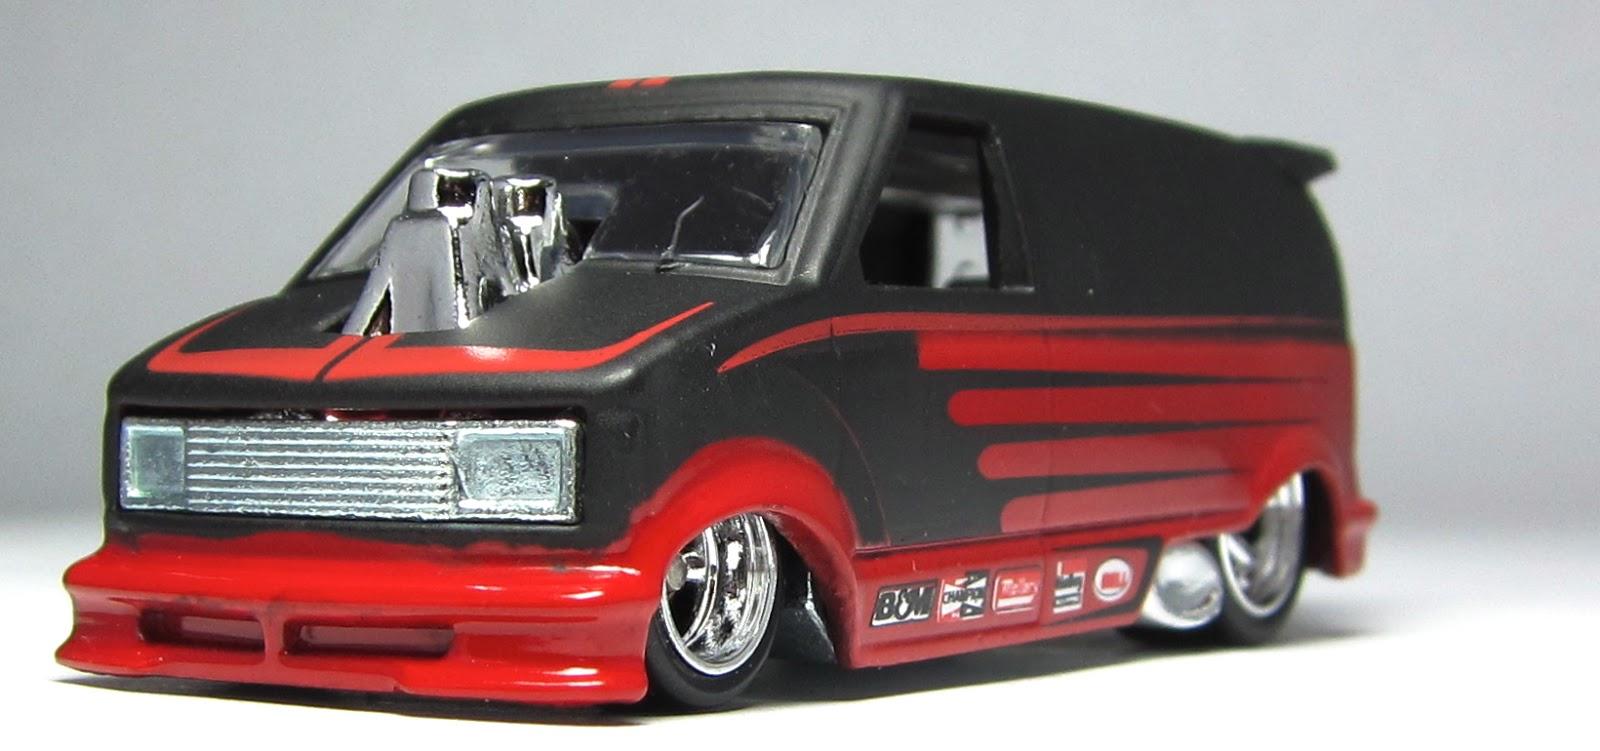 All Chevy chevy astro van : Boulevard '85 Chevy Astro Van - Hot Wheels Club ZA